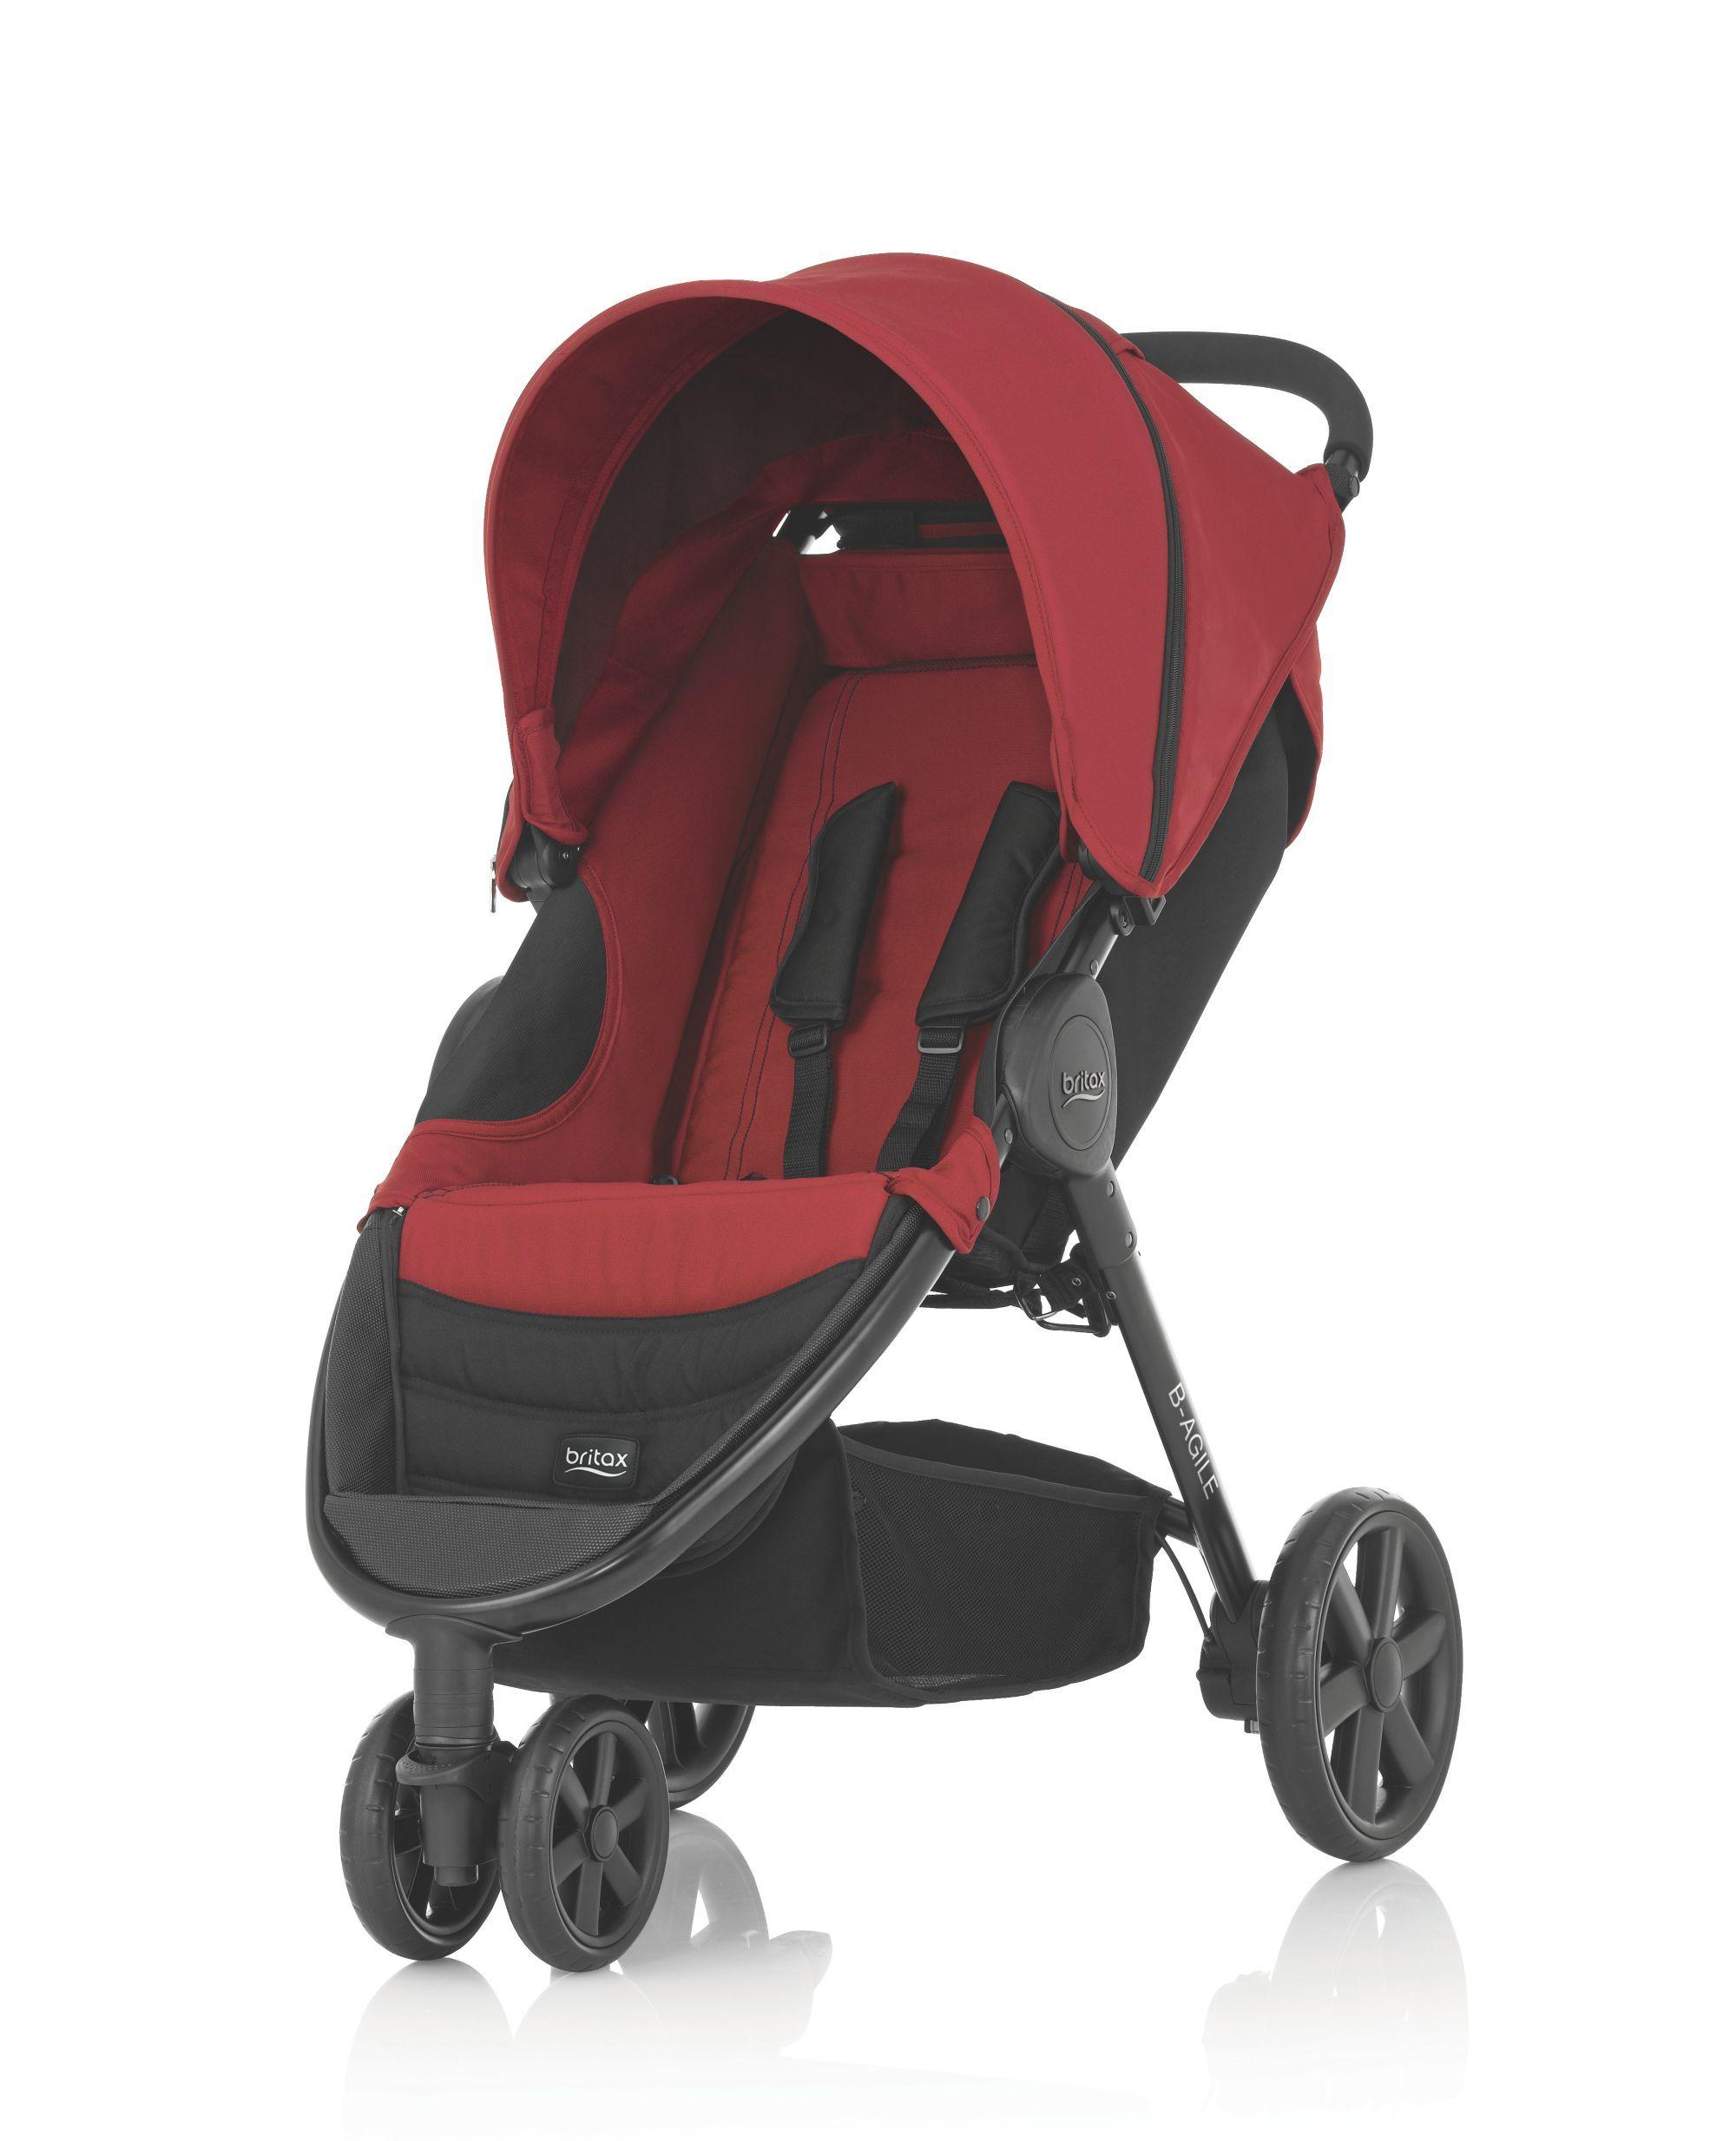 16++ Apruva stroller black and red info